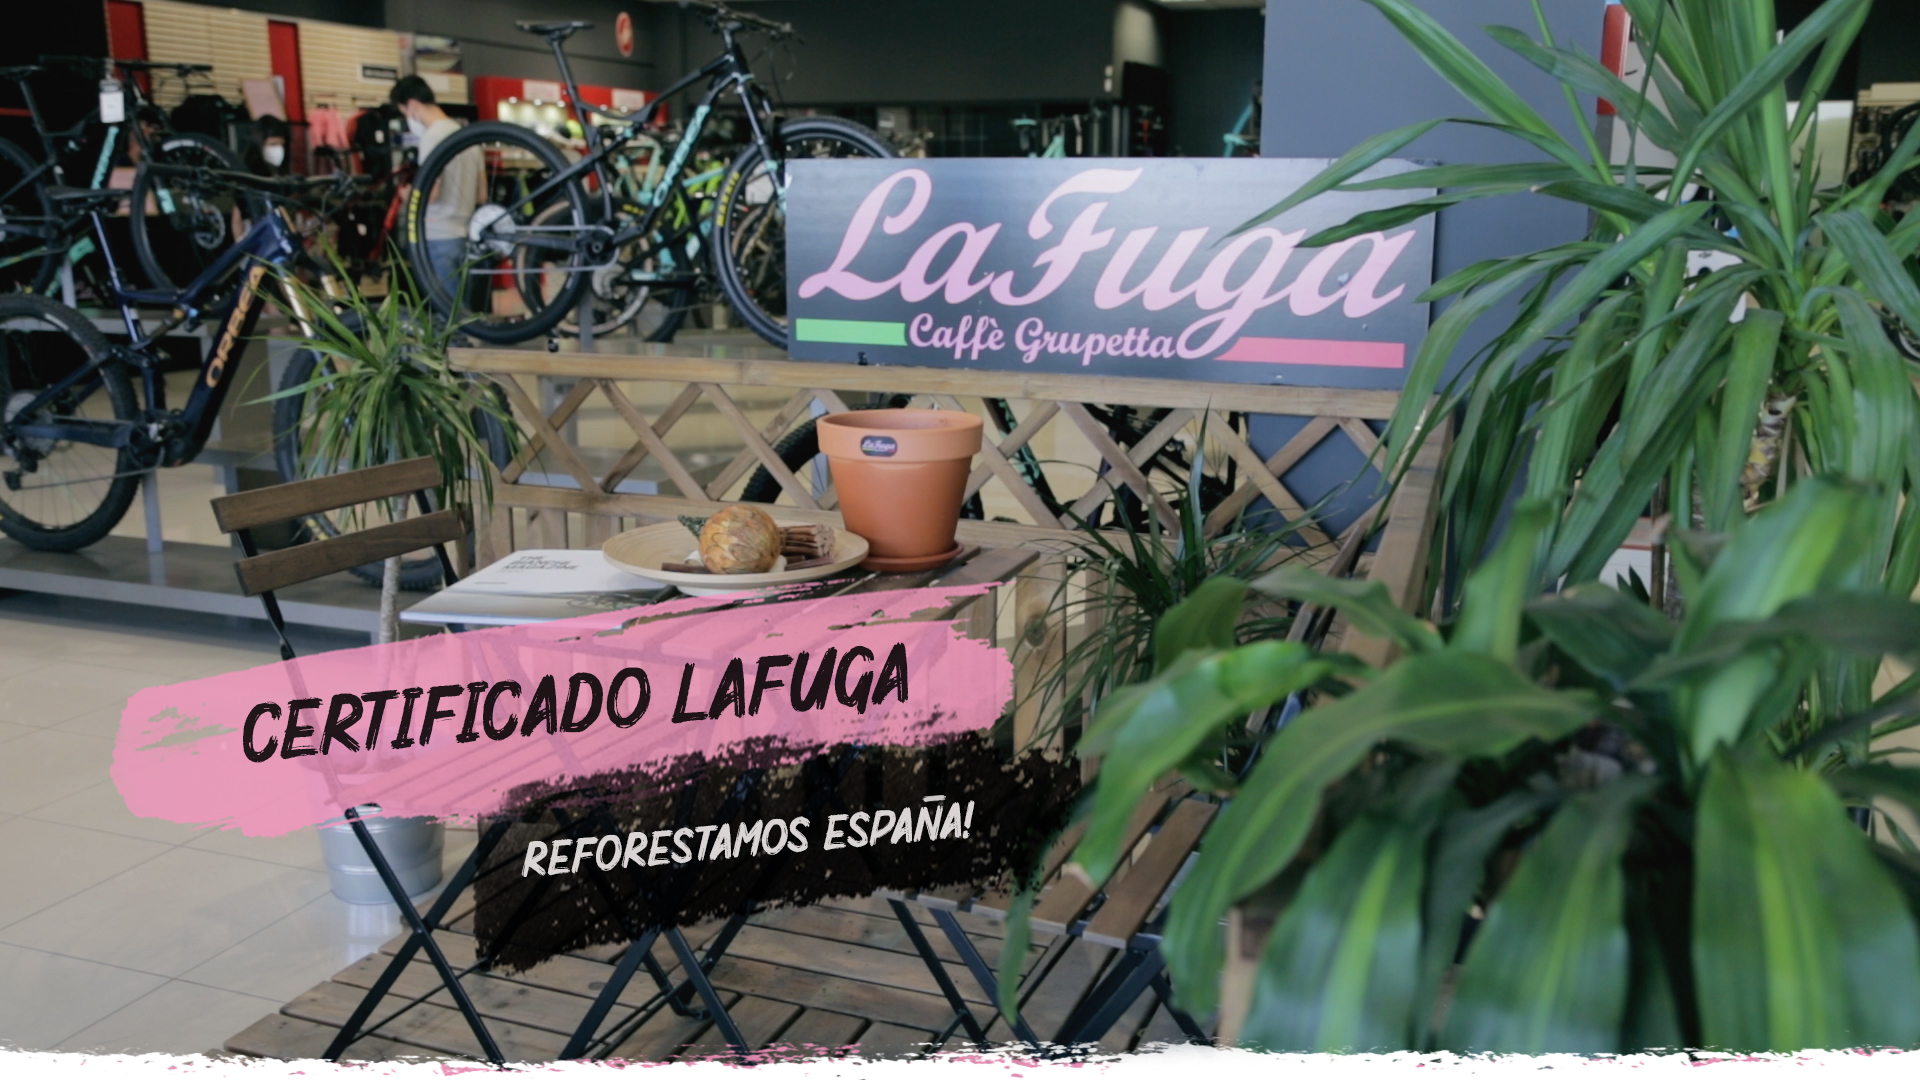 Lafuga garantiza tu contribución a la reforestación en España